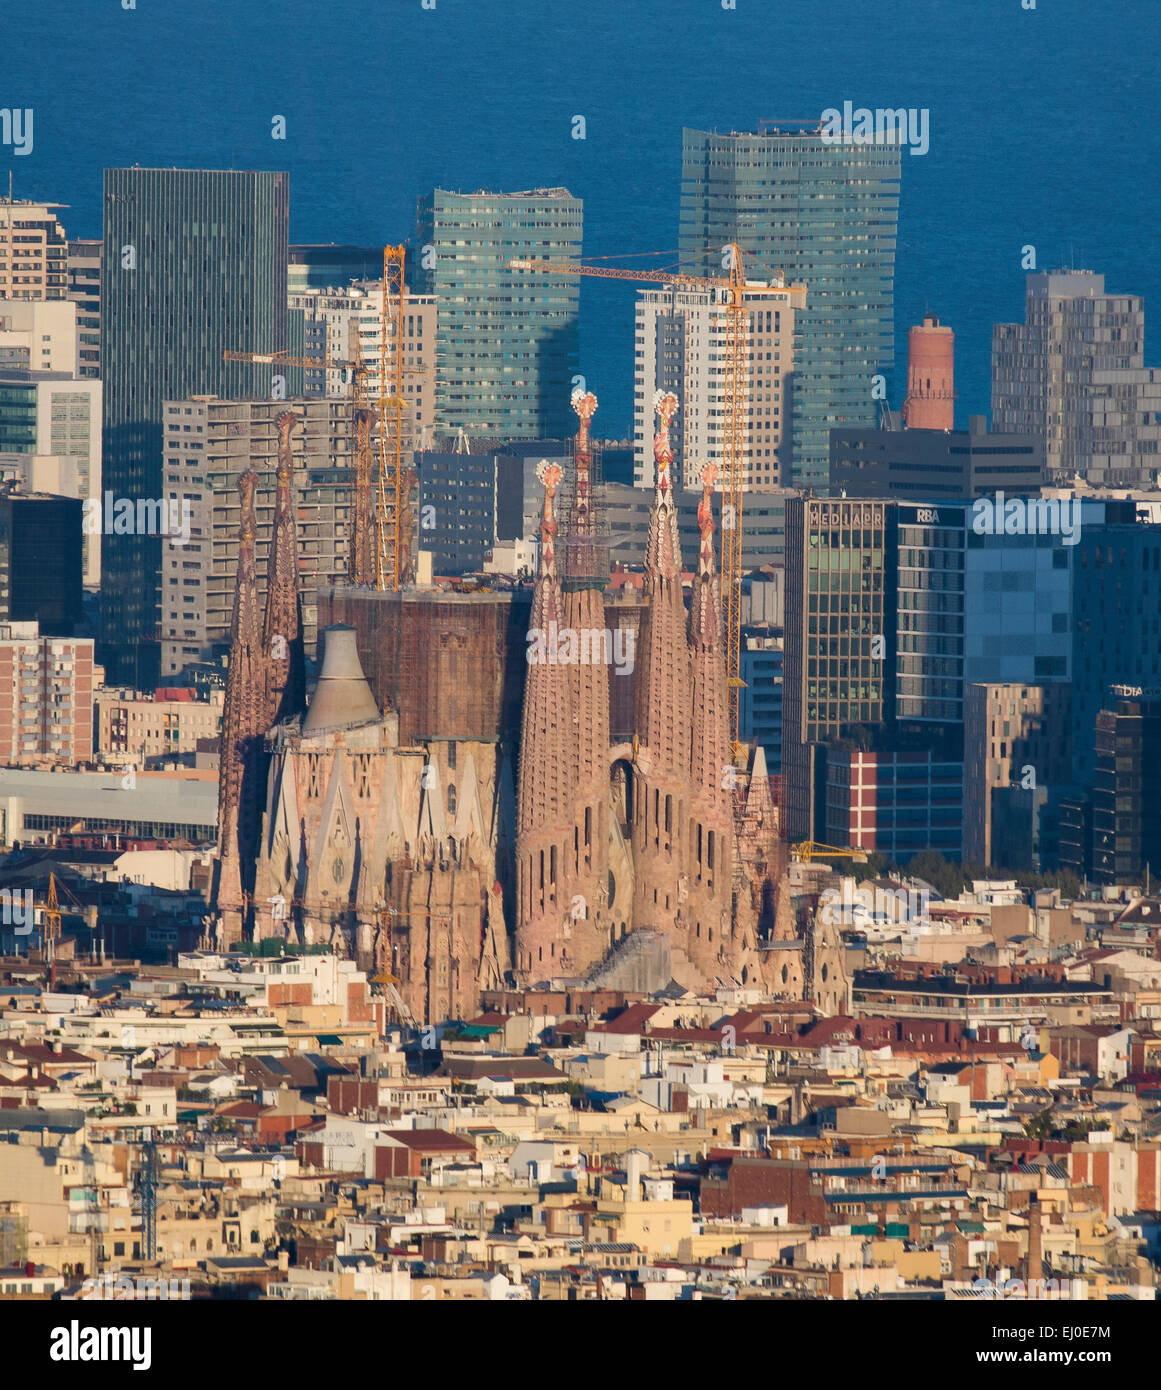 Barcelona, Stadt, Stadtbild, Sagrada Familia, Kirche, Spanien, Europa, Antenne, Agbar, Architektur, Katalonien, Stockbild